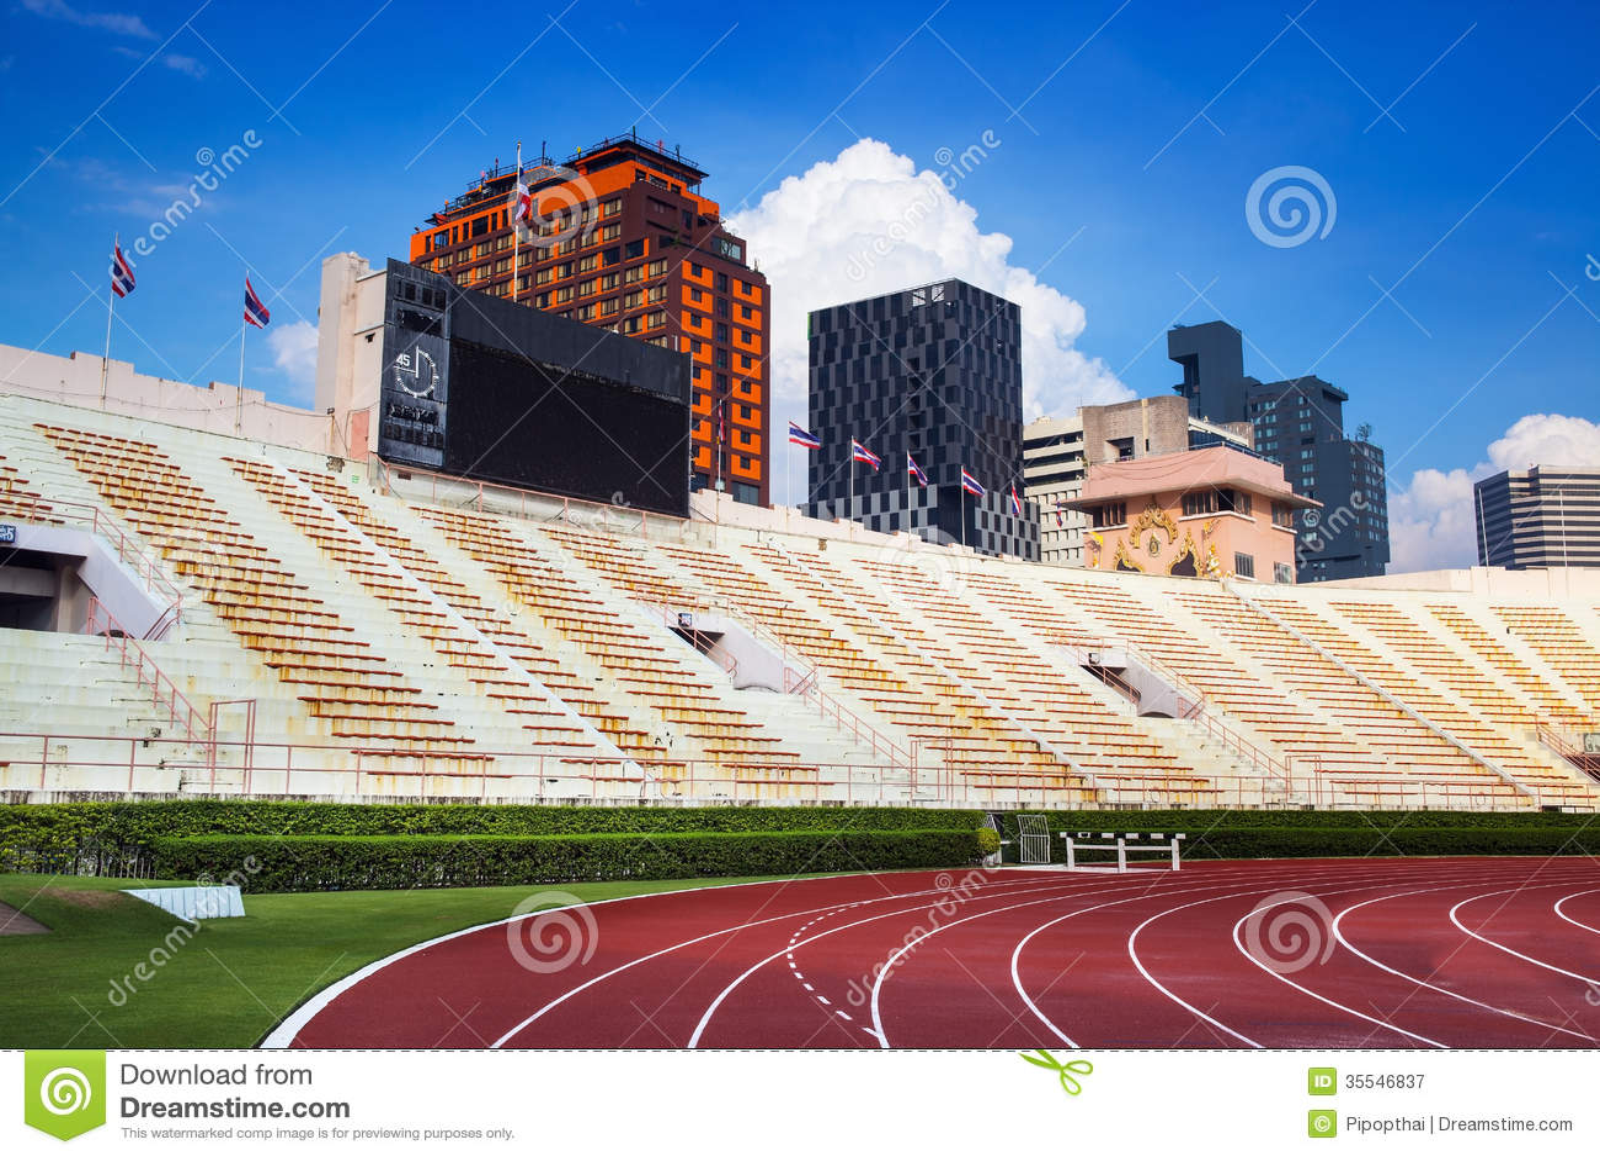 The National Stadium Of Thailand Or Suphachalasai Stadium Bangkok Stock Image Image Of